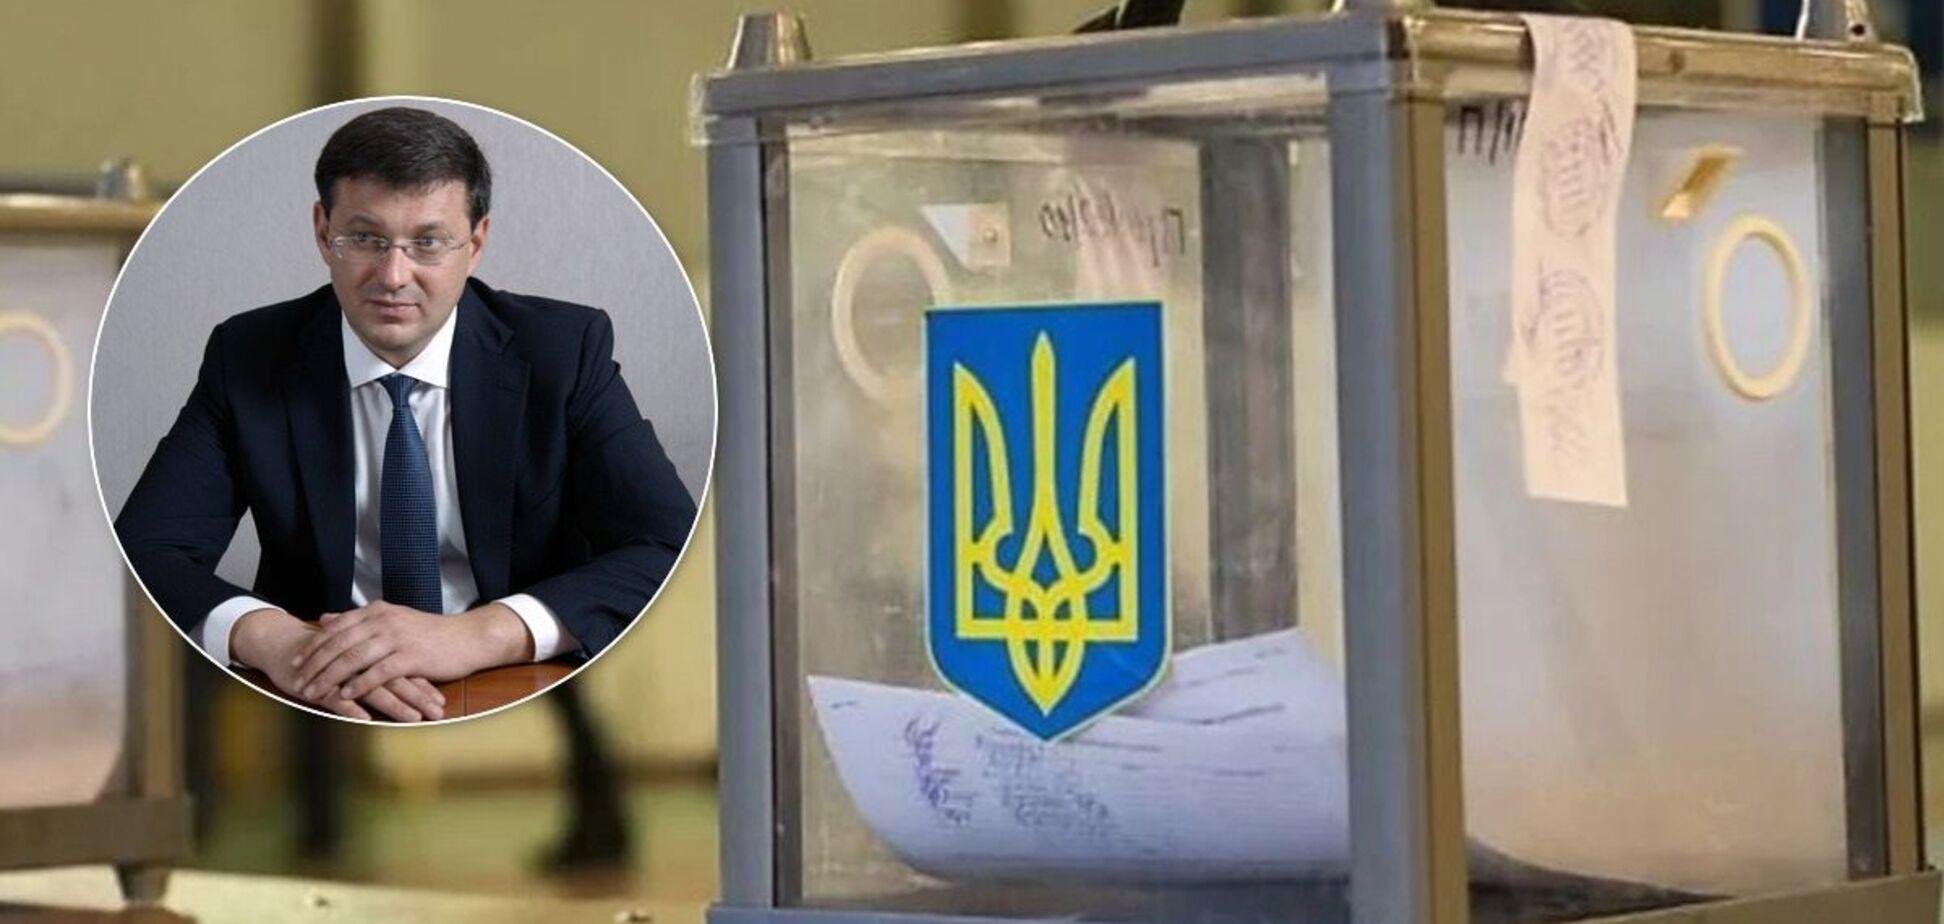 Сапожко избран мэром Броваров